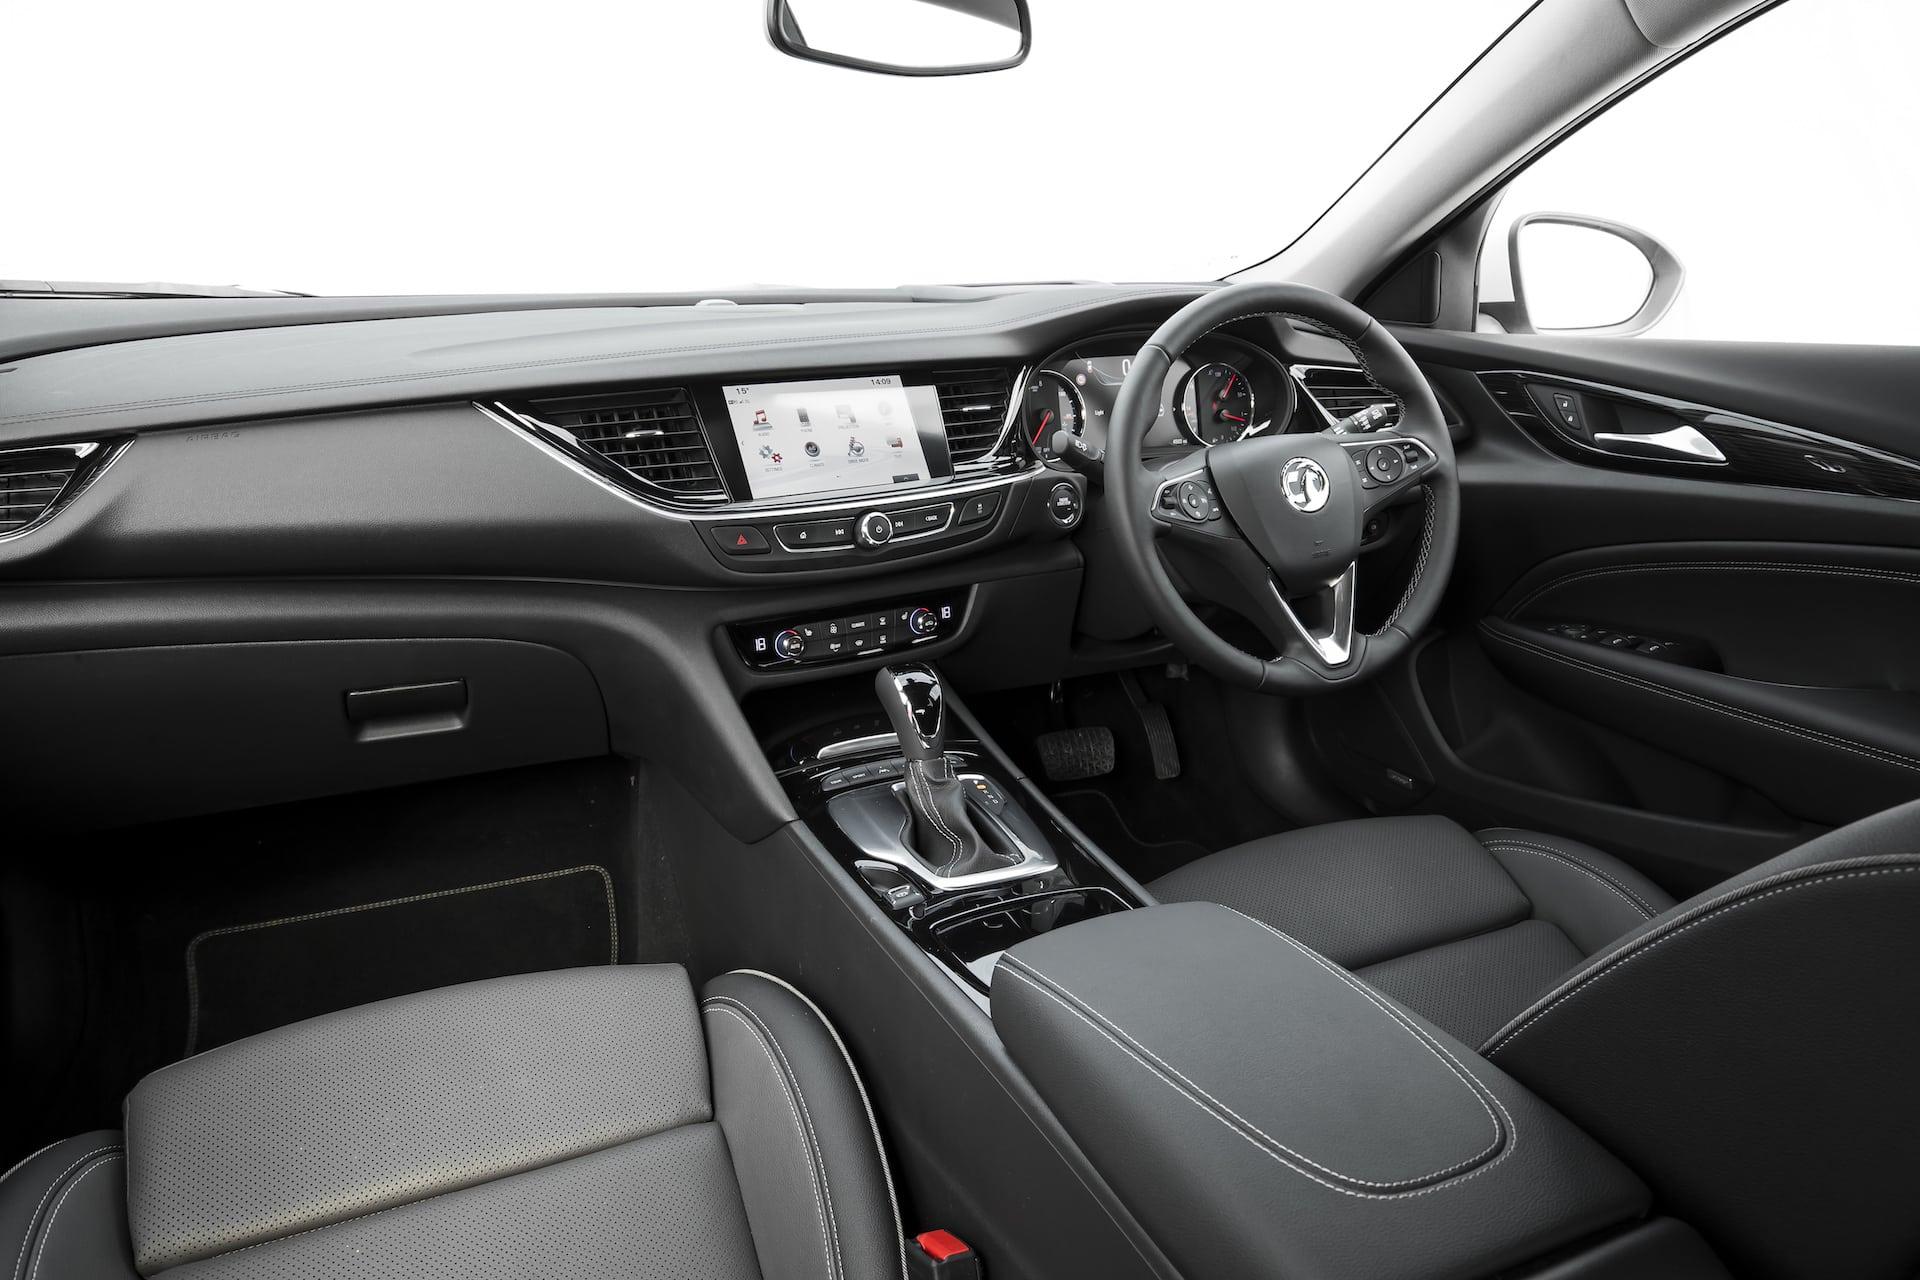 Vauxhall Insignia Grand Sport interior | The Car Expert